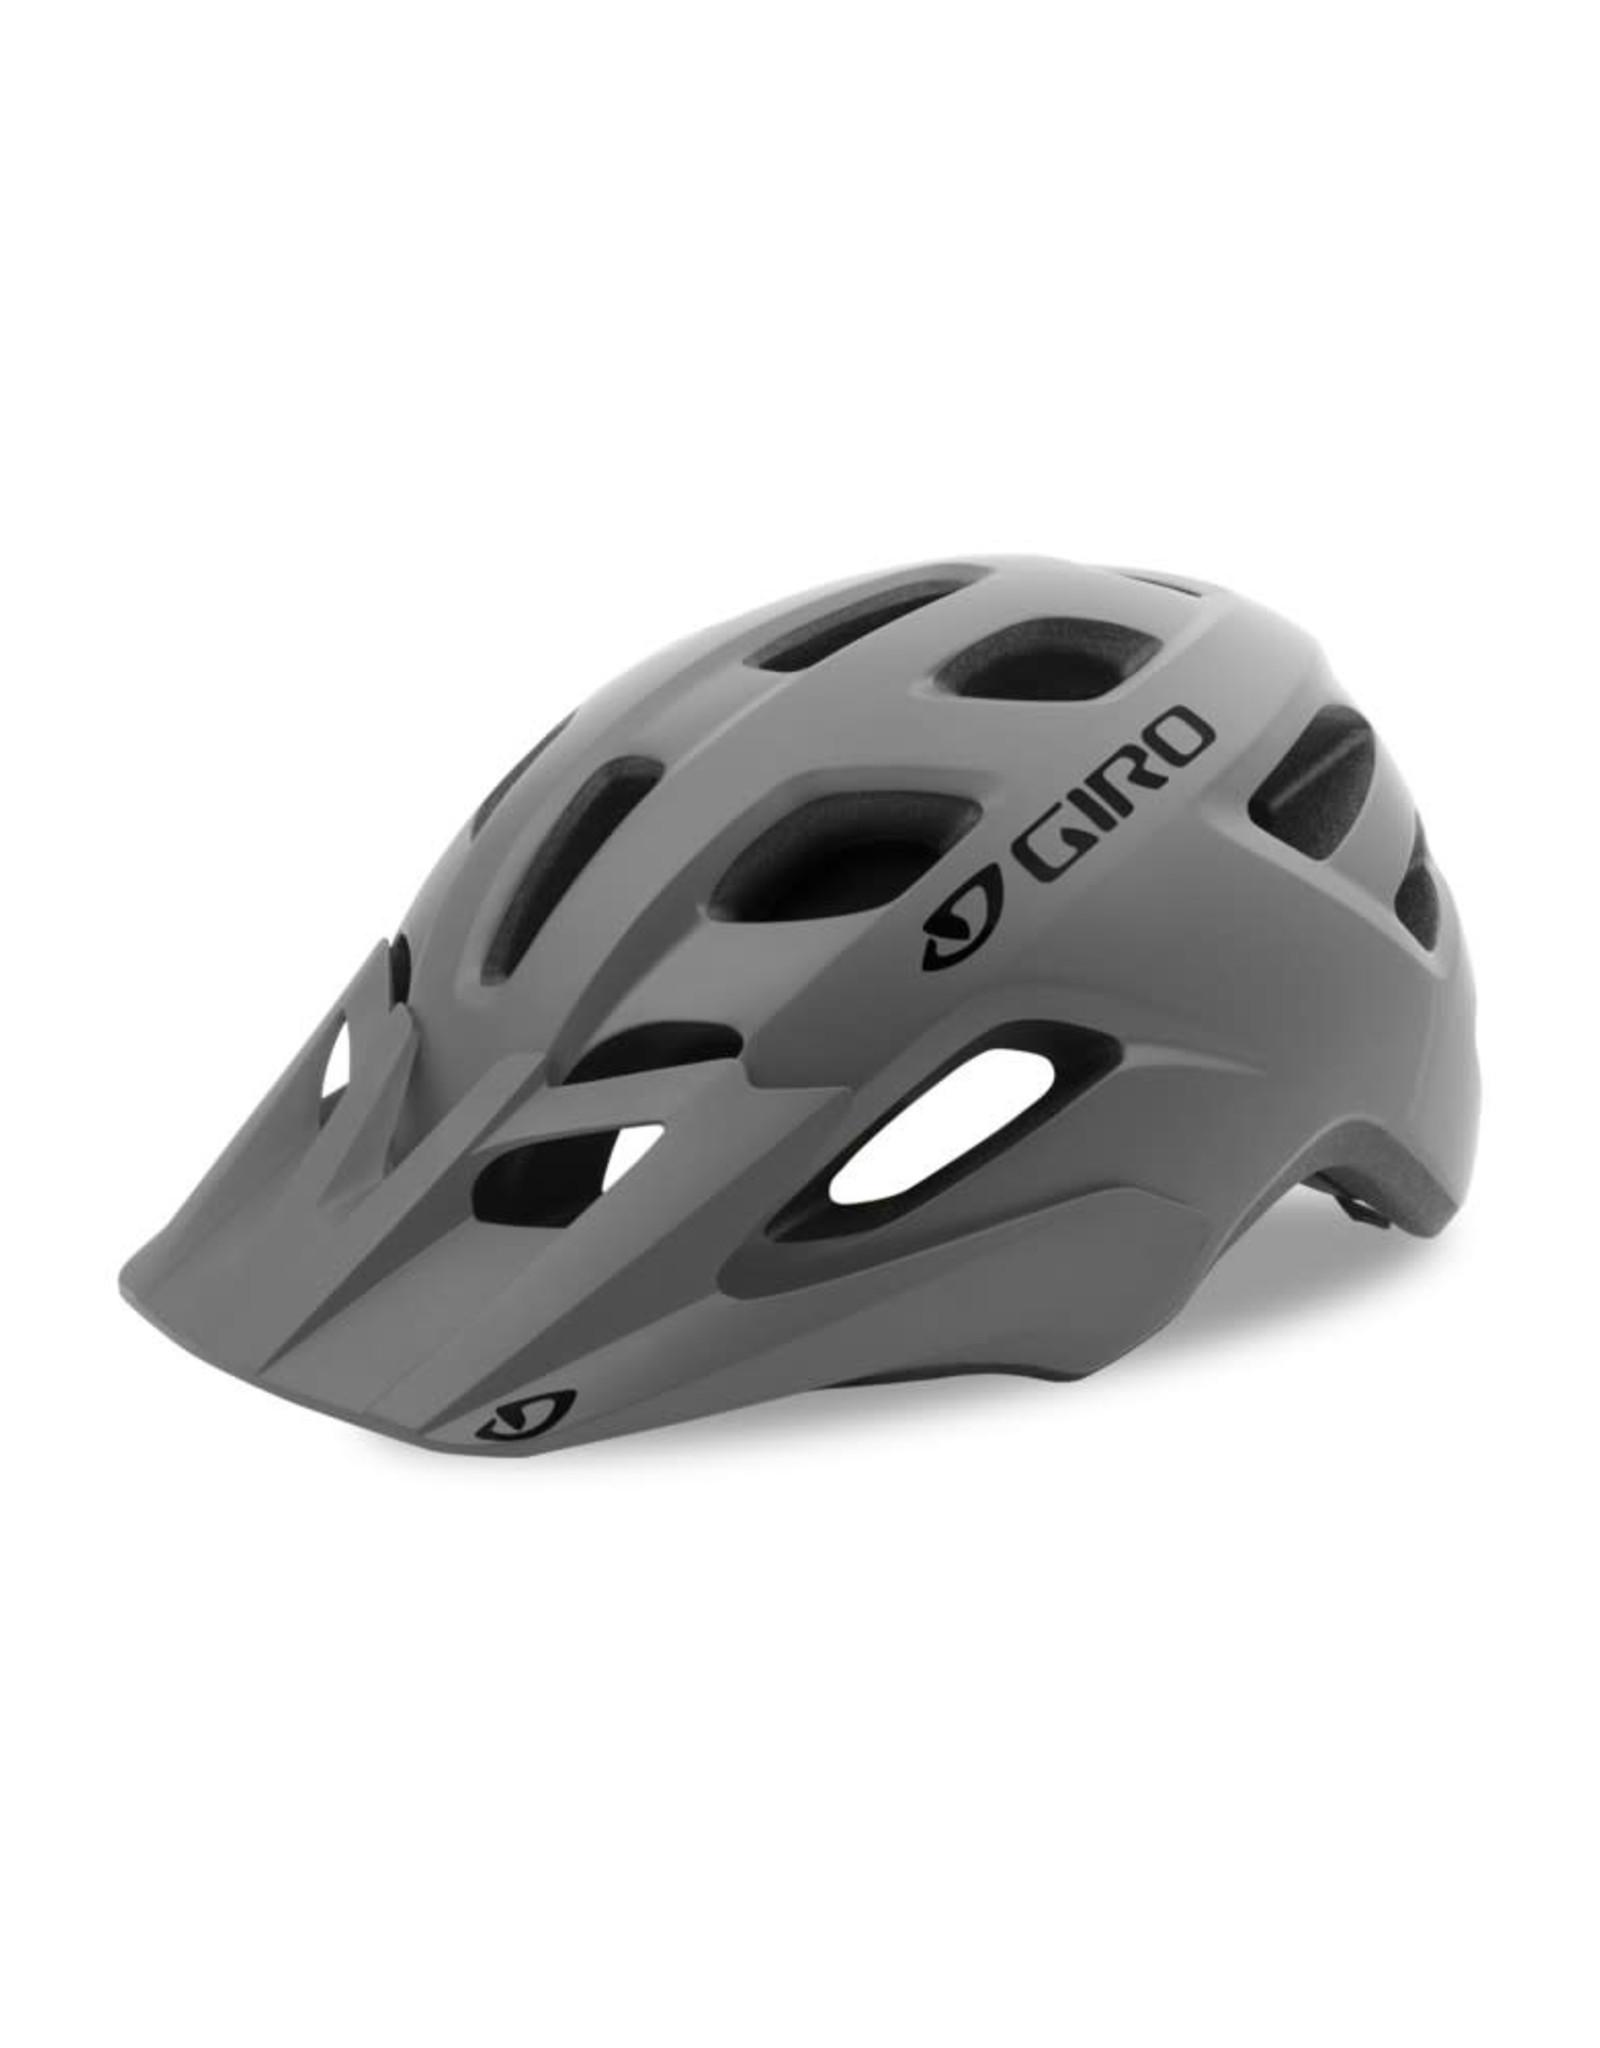 GIRO Compound MIPS - Fixture MIPS XL Helmet